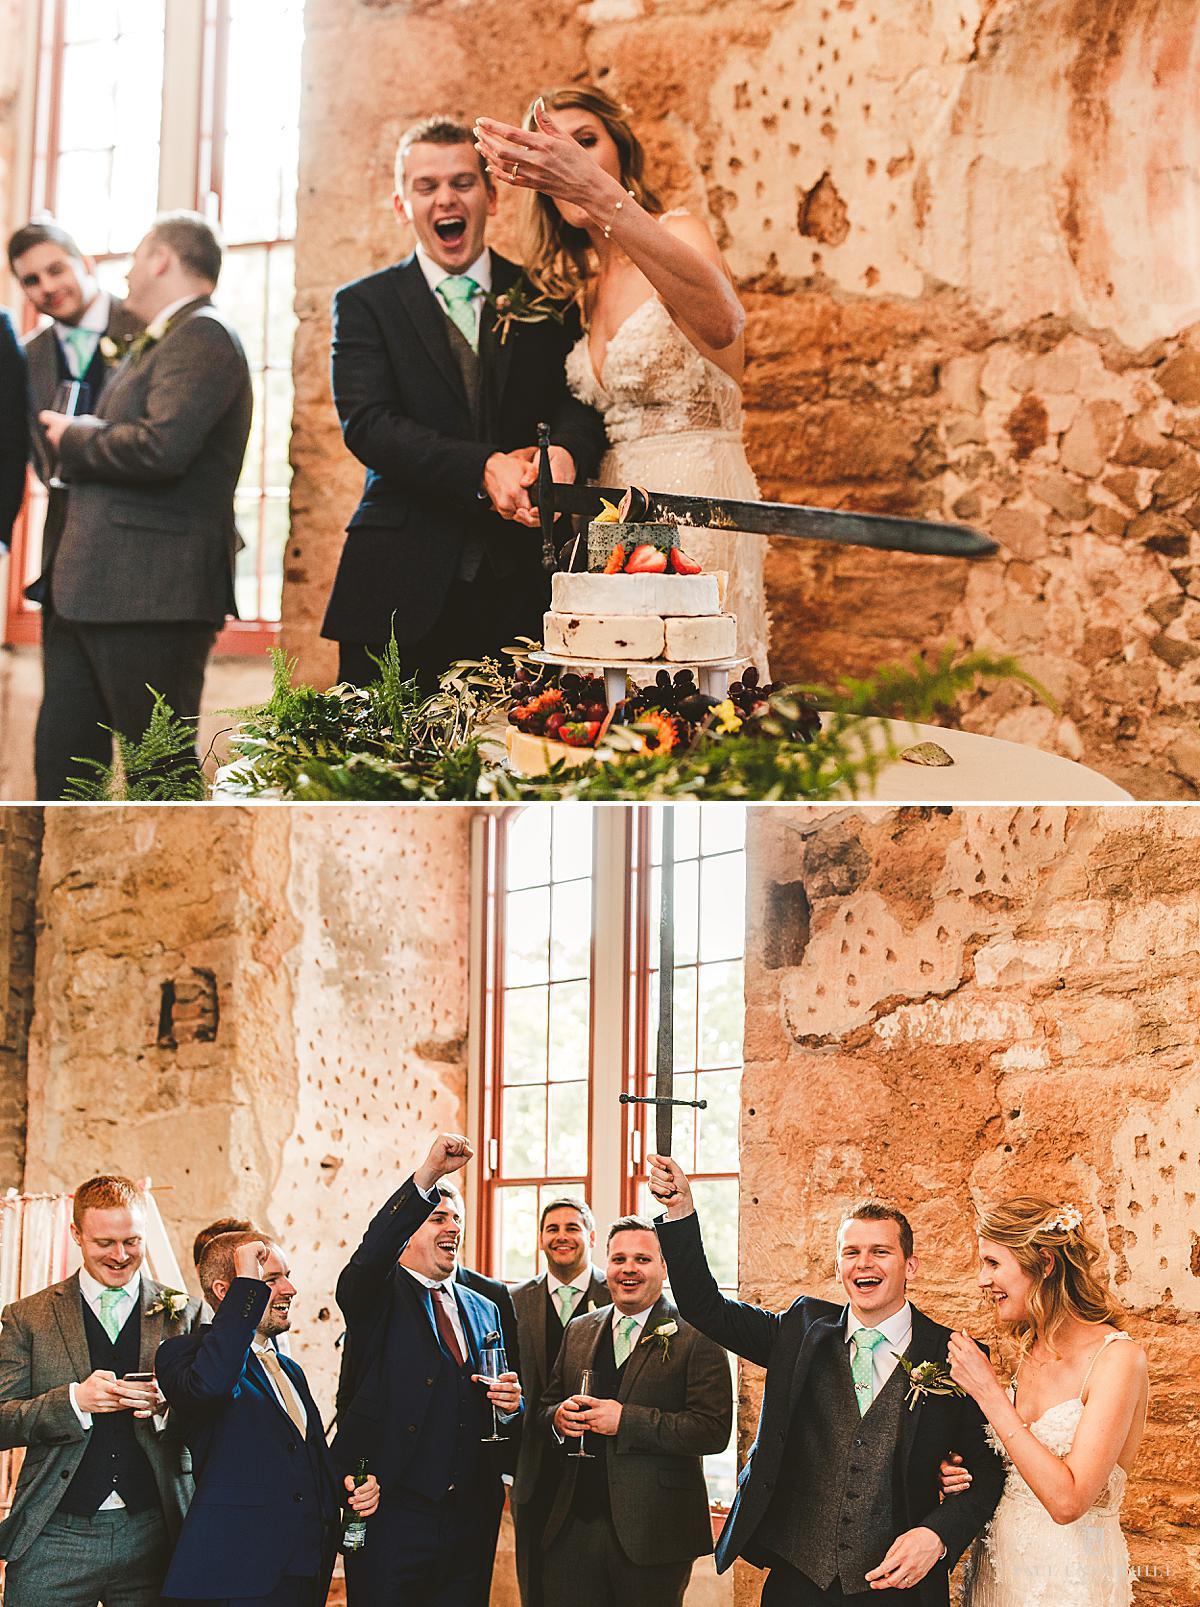 Cake cutting Lulworth Castle